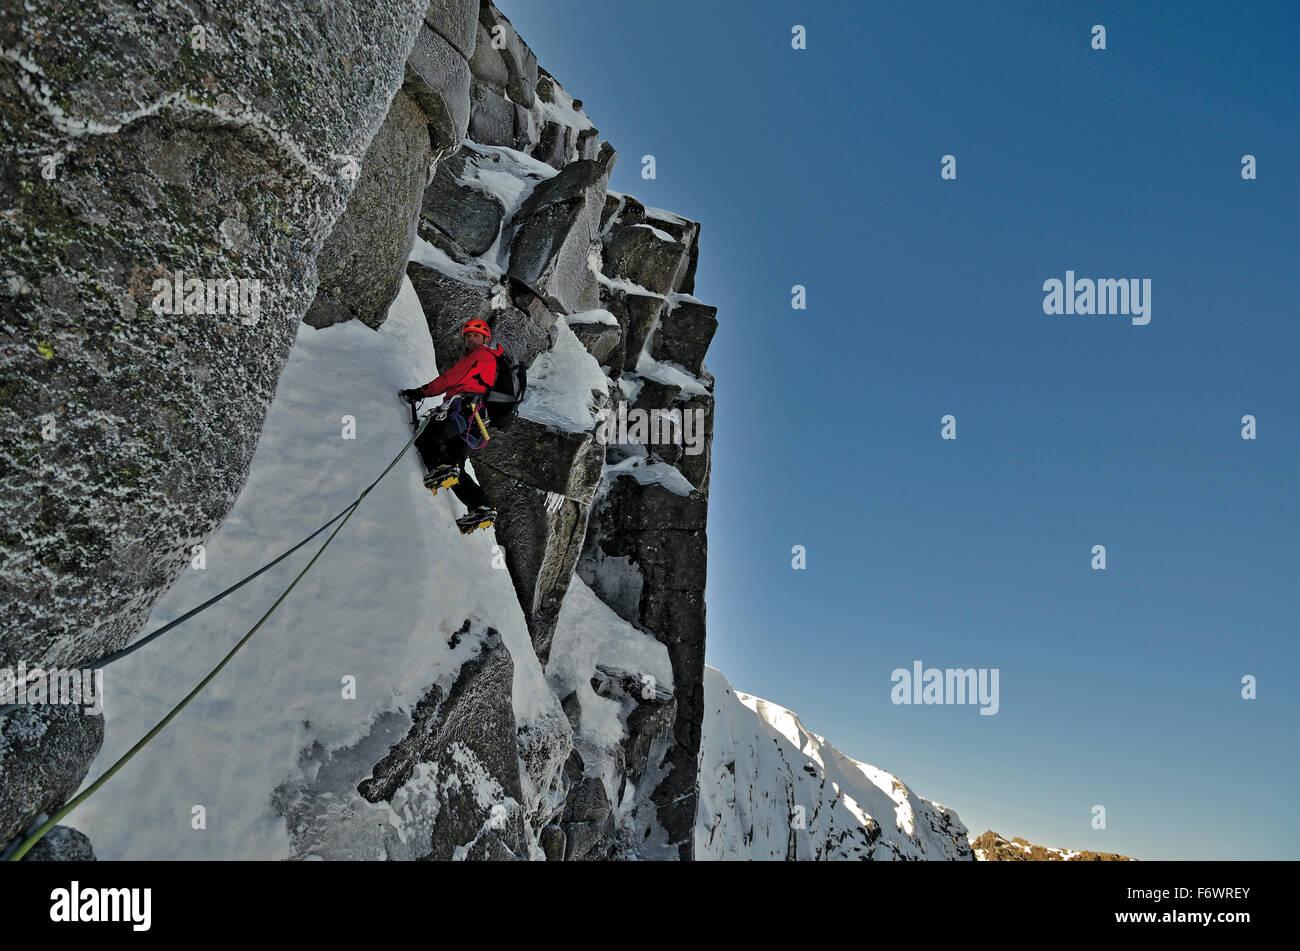 Climber ascending Lochnagar, Cairngorms, Grampian Mountains, Scotland, Great Britain - Stock Image